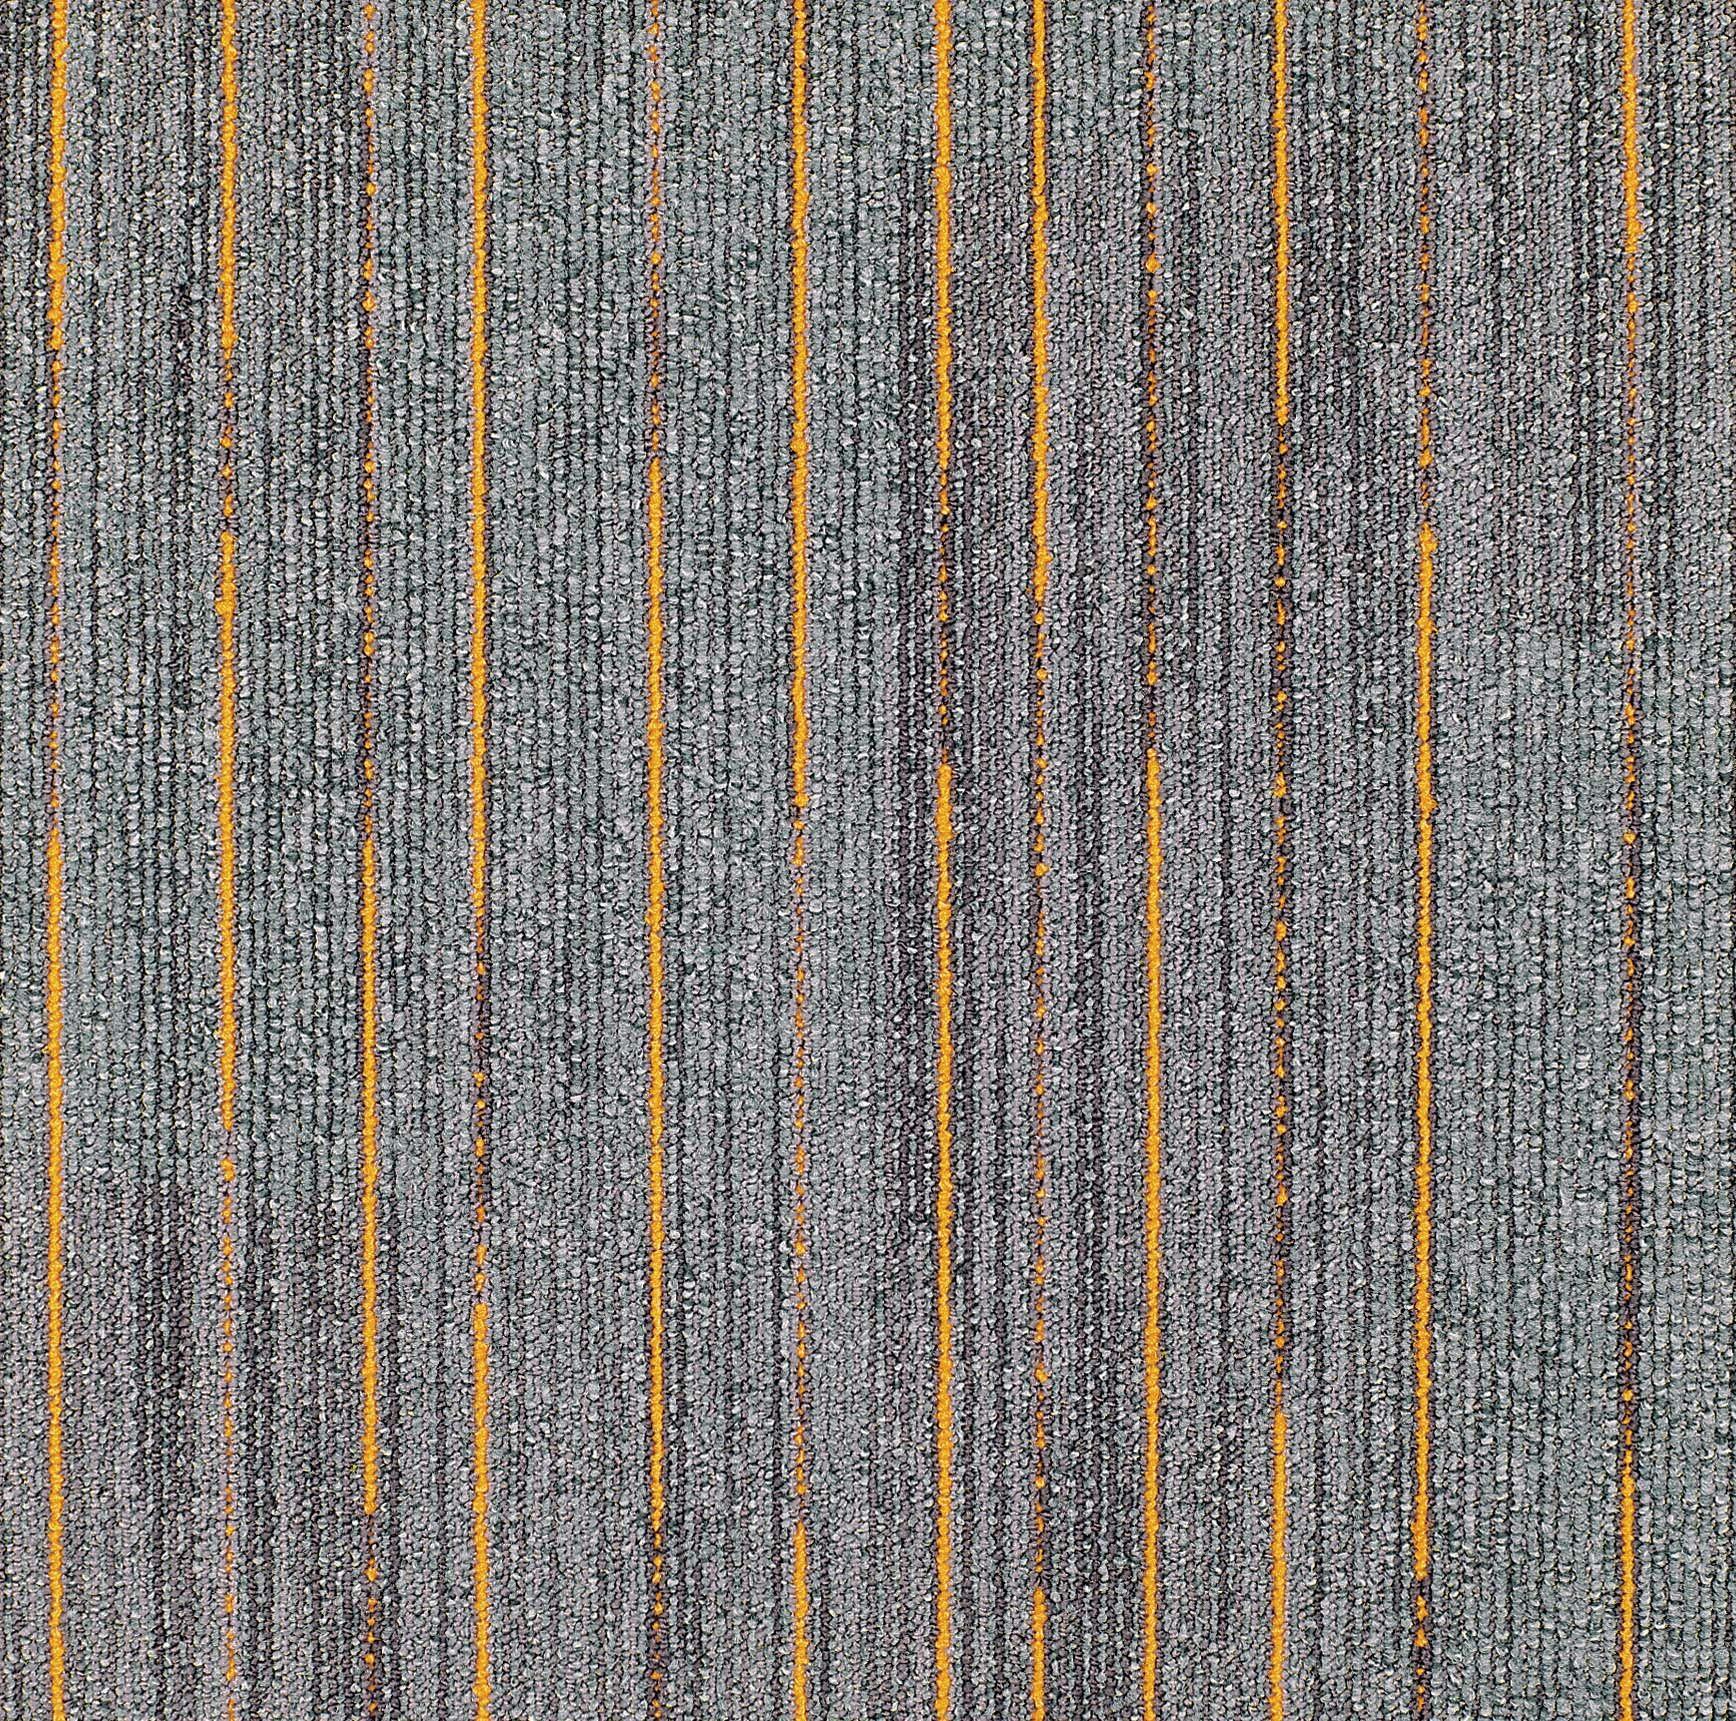 Light Trails By Milliken In Turbo Dsk10 Textured Carpet Rug